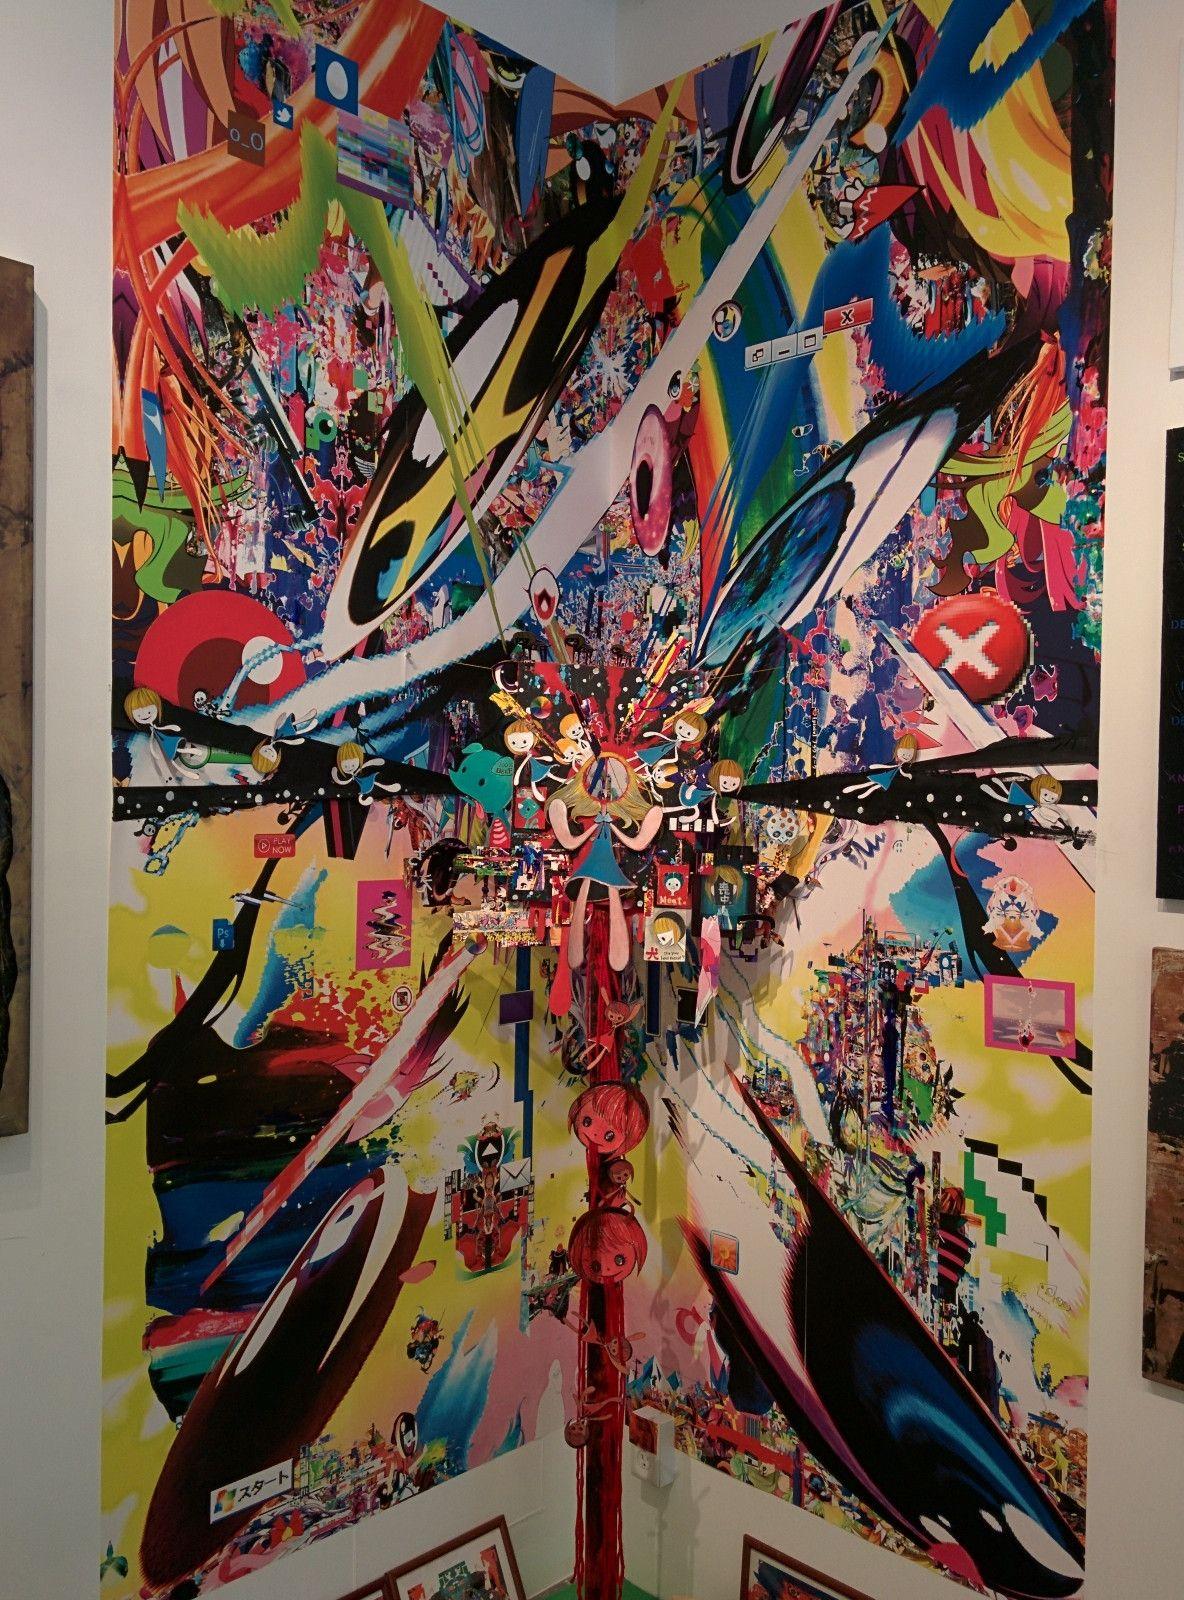 Siggithevanquisher Psychedelic Art Art Puella Magi Madoka Magica